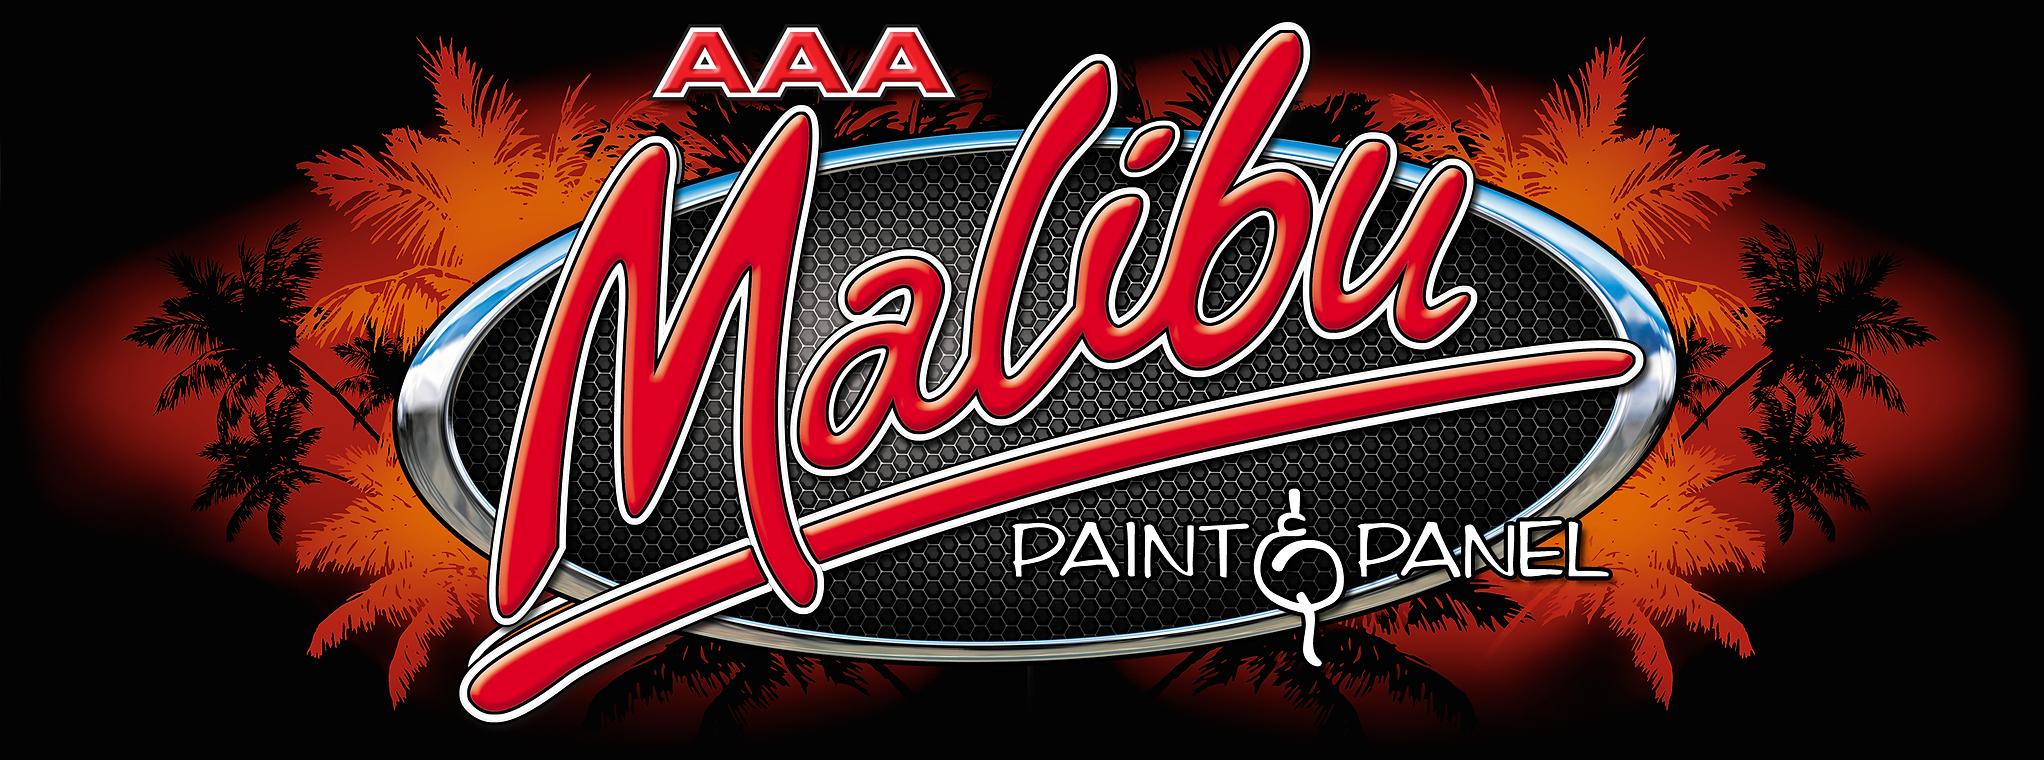 AAA Malibu logo .png